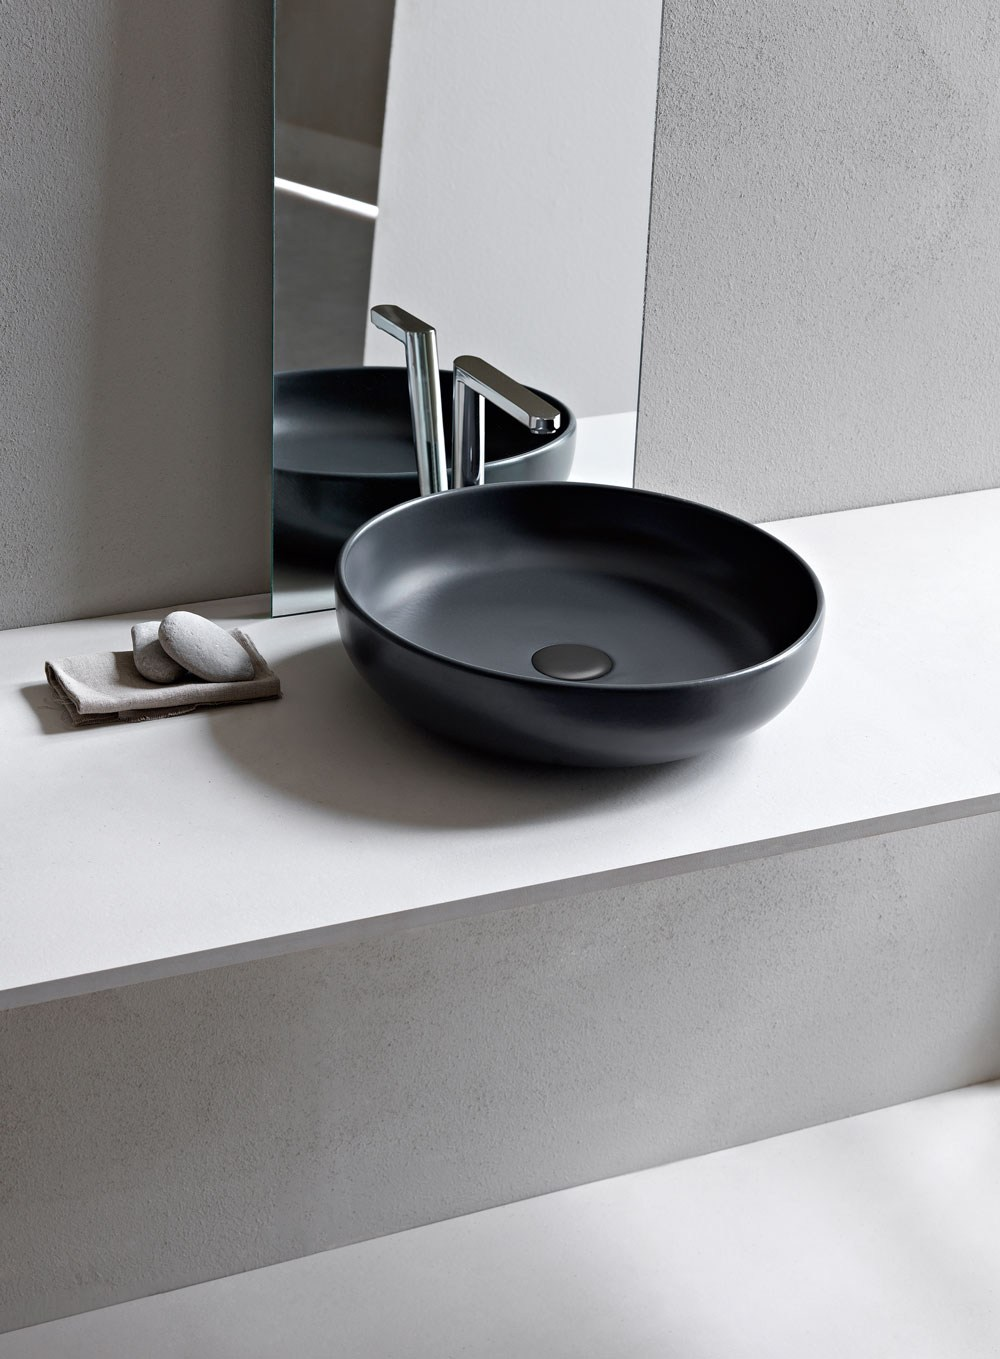 Shui lavabo redondo by ceramica cielo dise o paolo d - Lavabos redondos sobre encimera ...